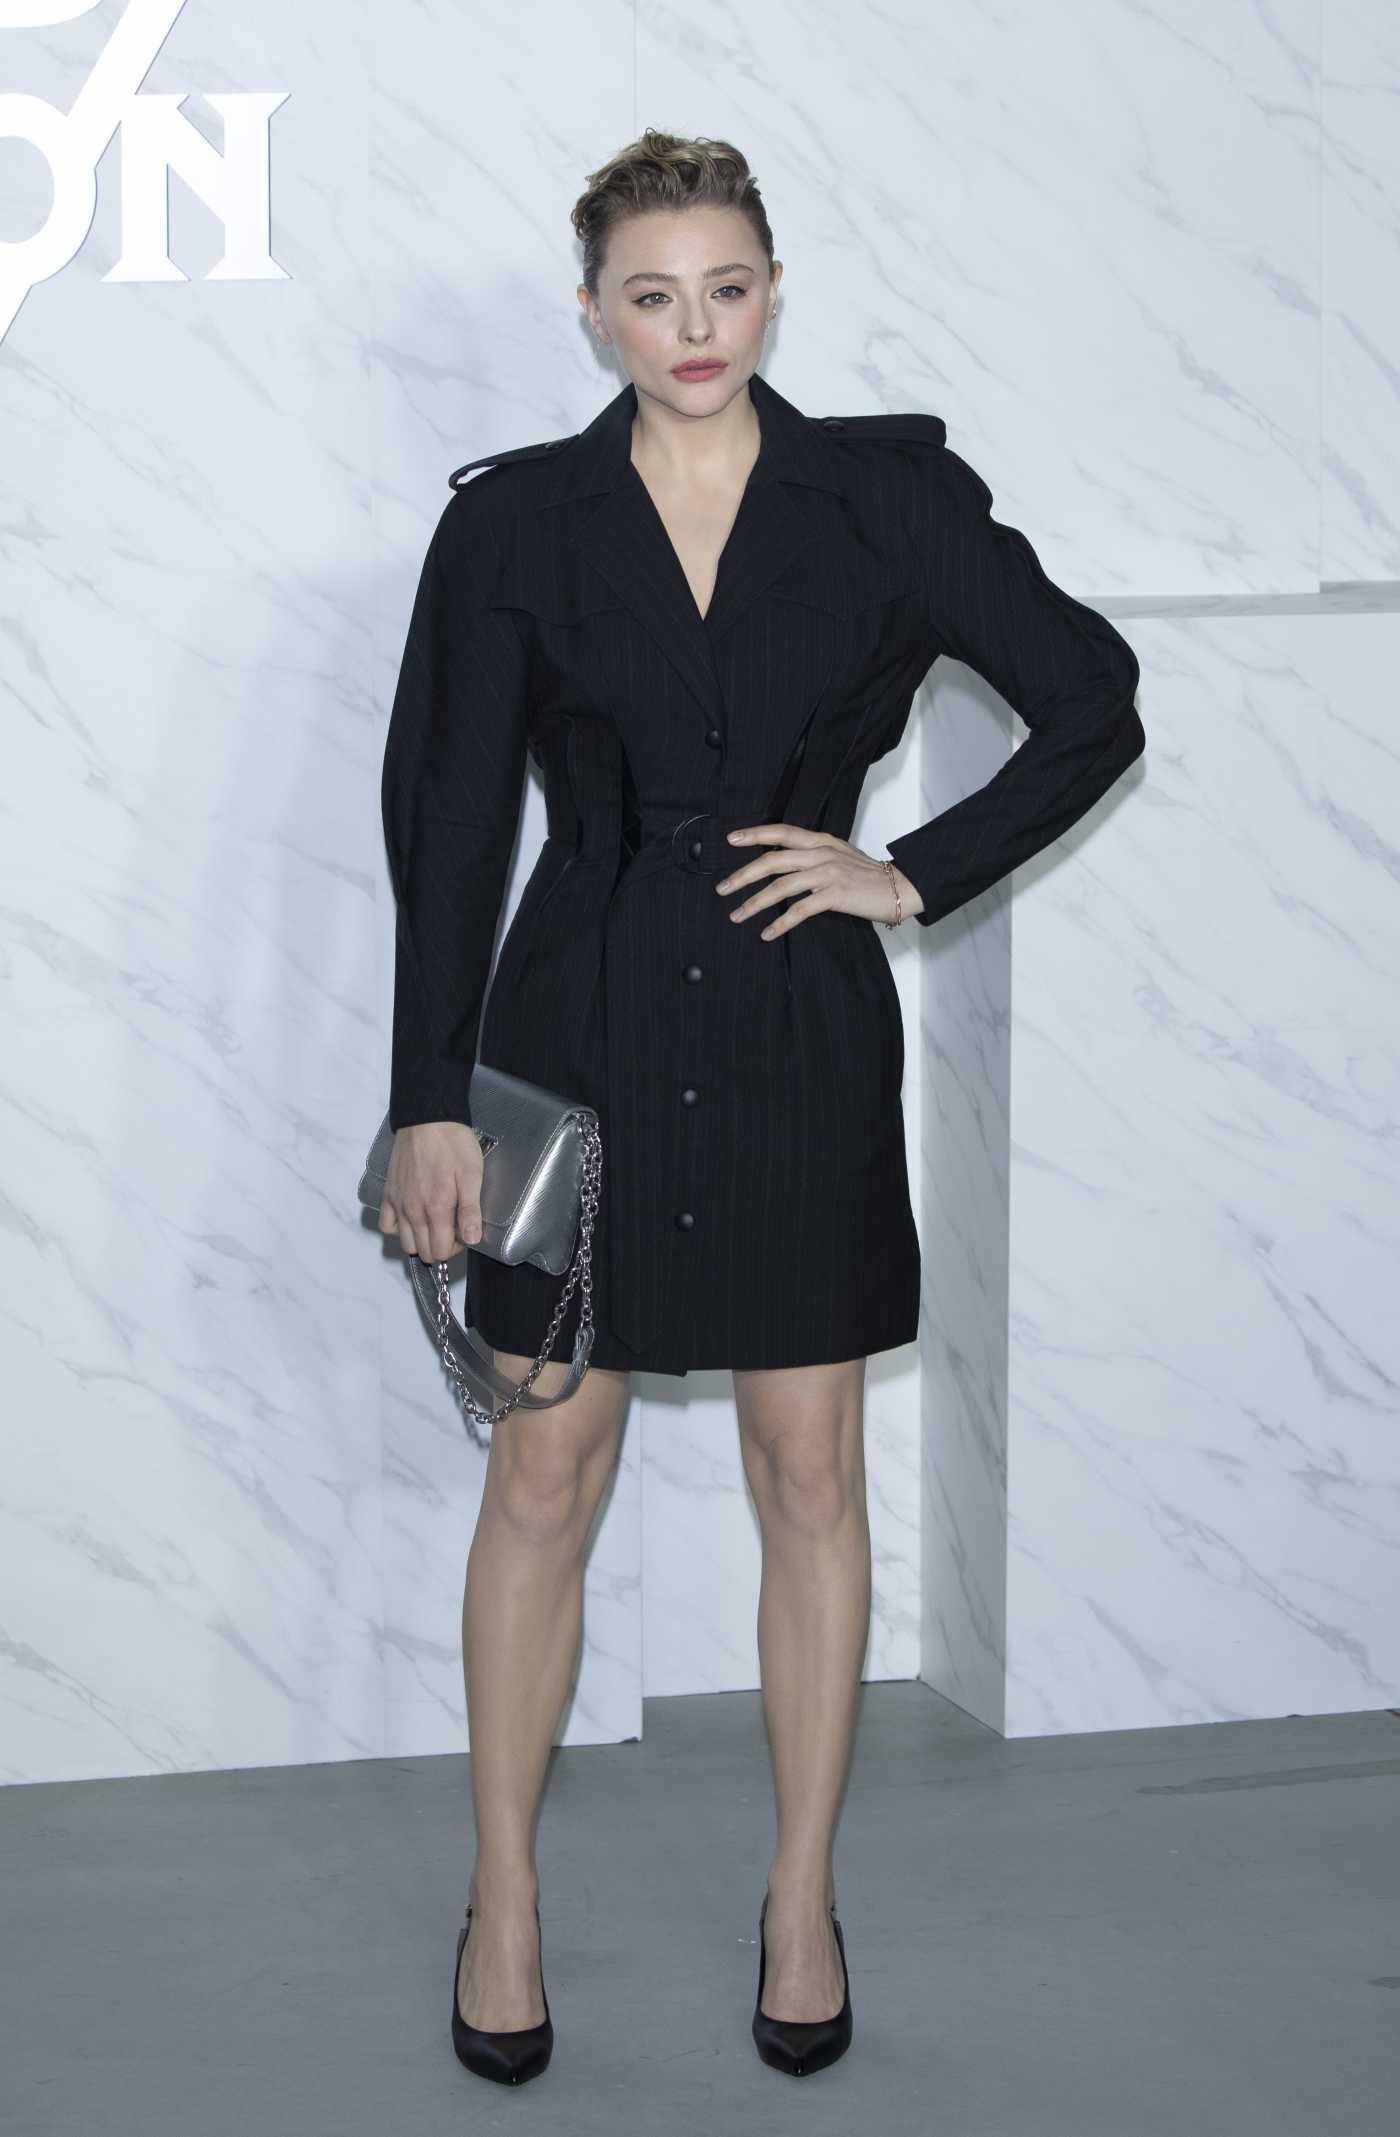 Chloe Moretz Attends the Louis Vuitton South Korea Women's Fashion Show in Seoul 10/31/2019